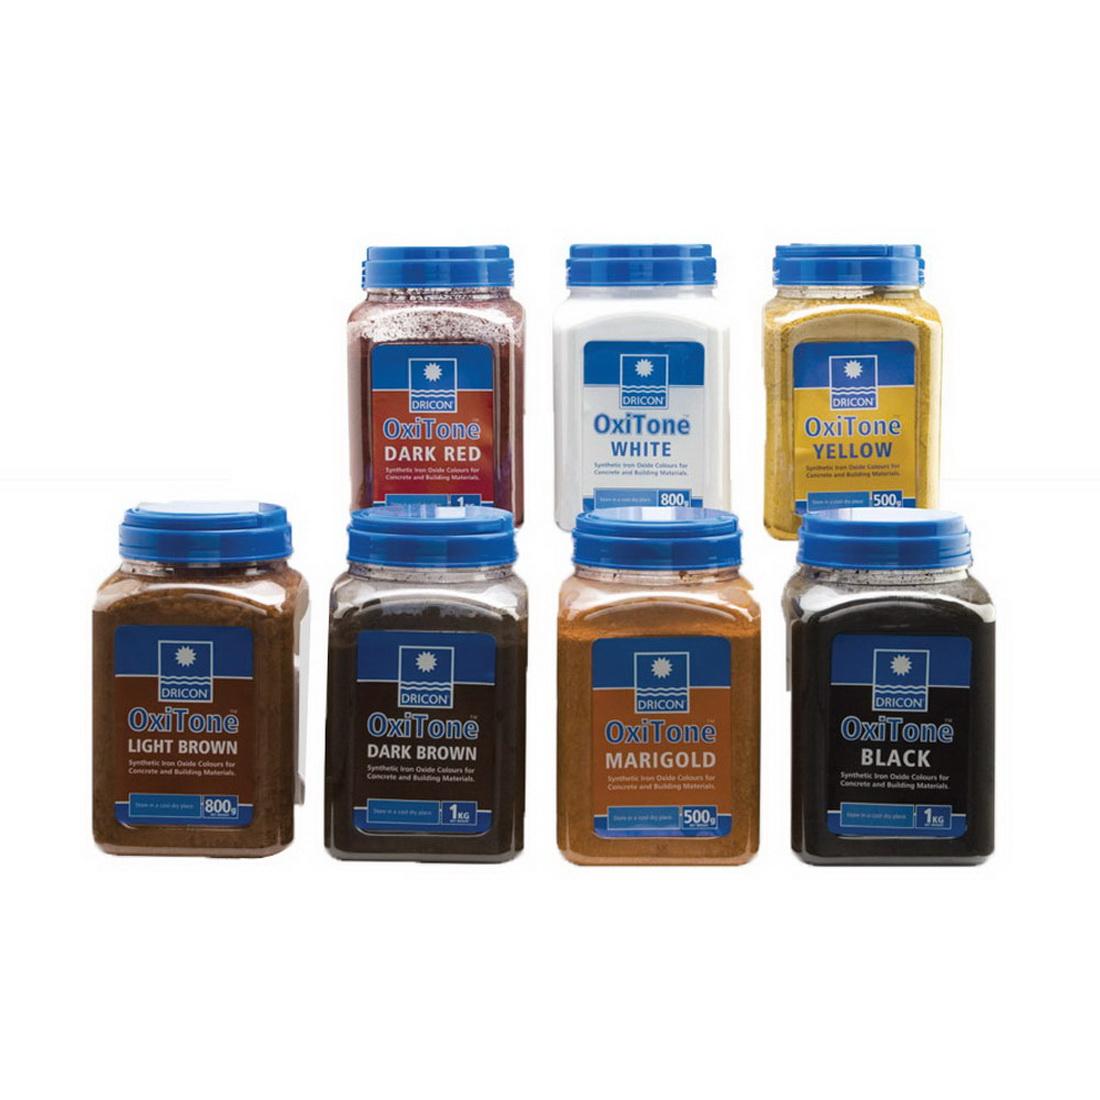 Oxitone Oxide Dark Brown 1kg